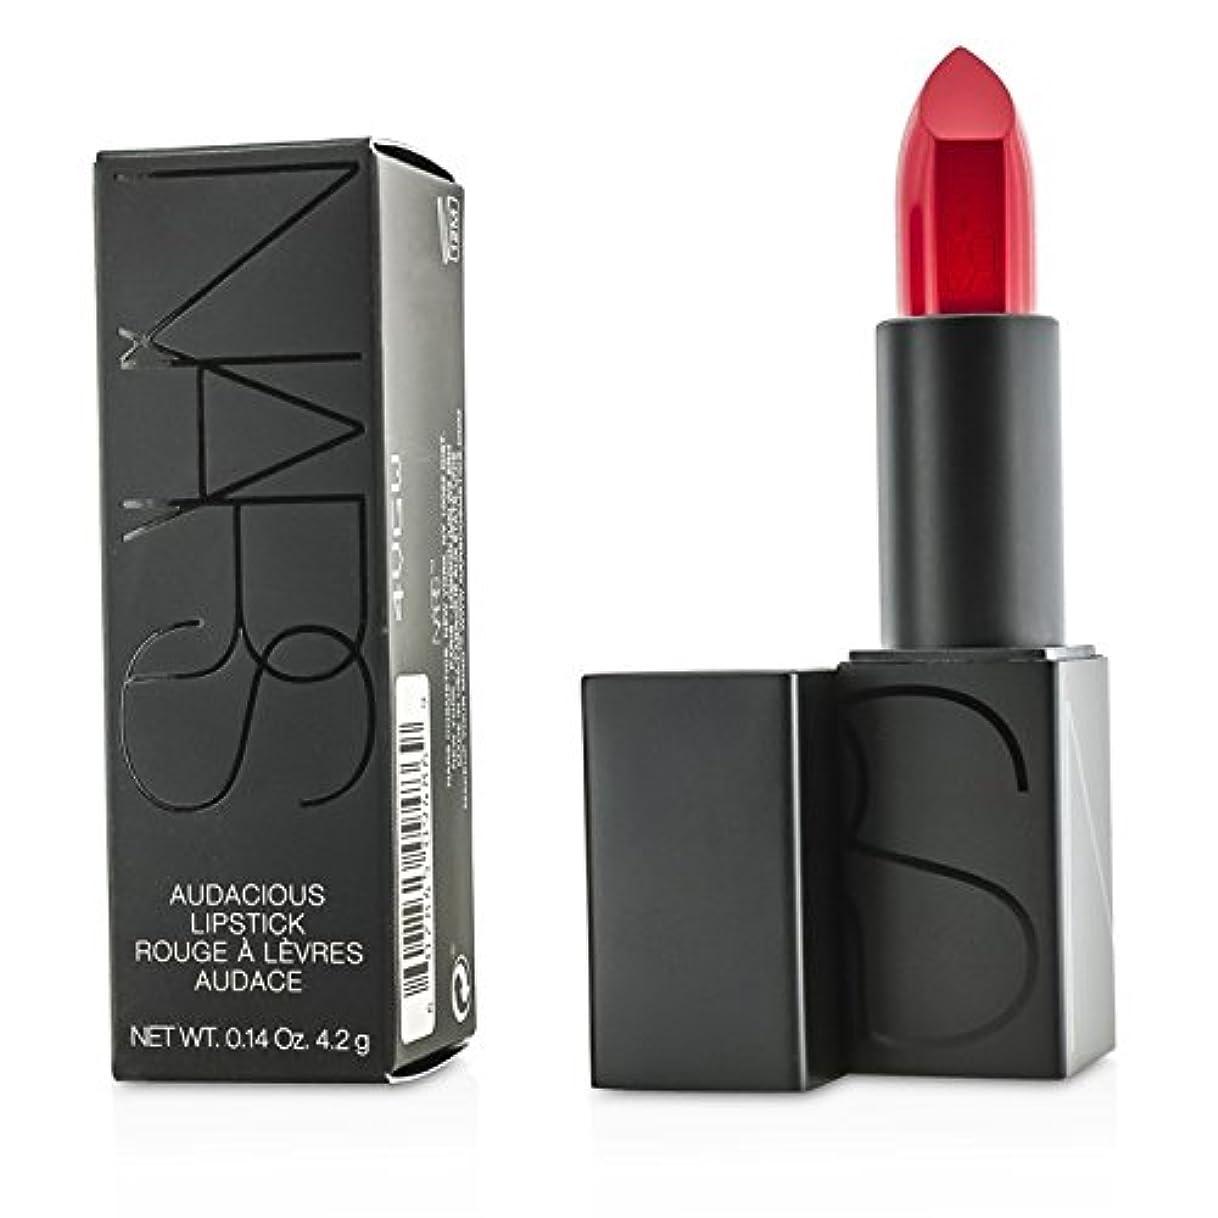 複製退屈配列ナーズ Audacious Lipstick - Kelly 4.2g/0.14oz並行輸入品